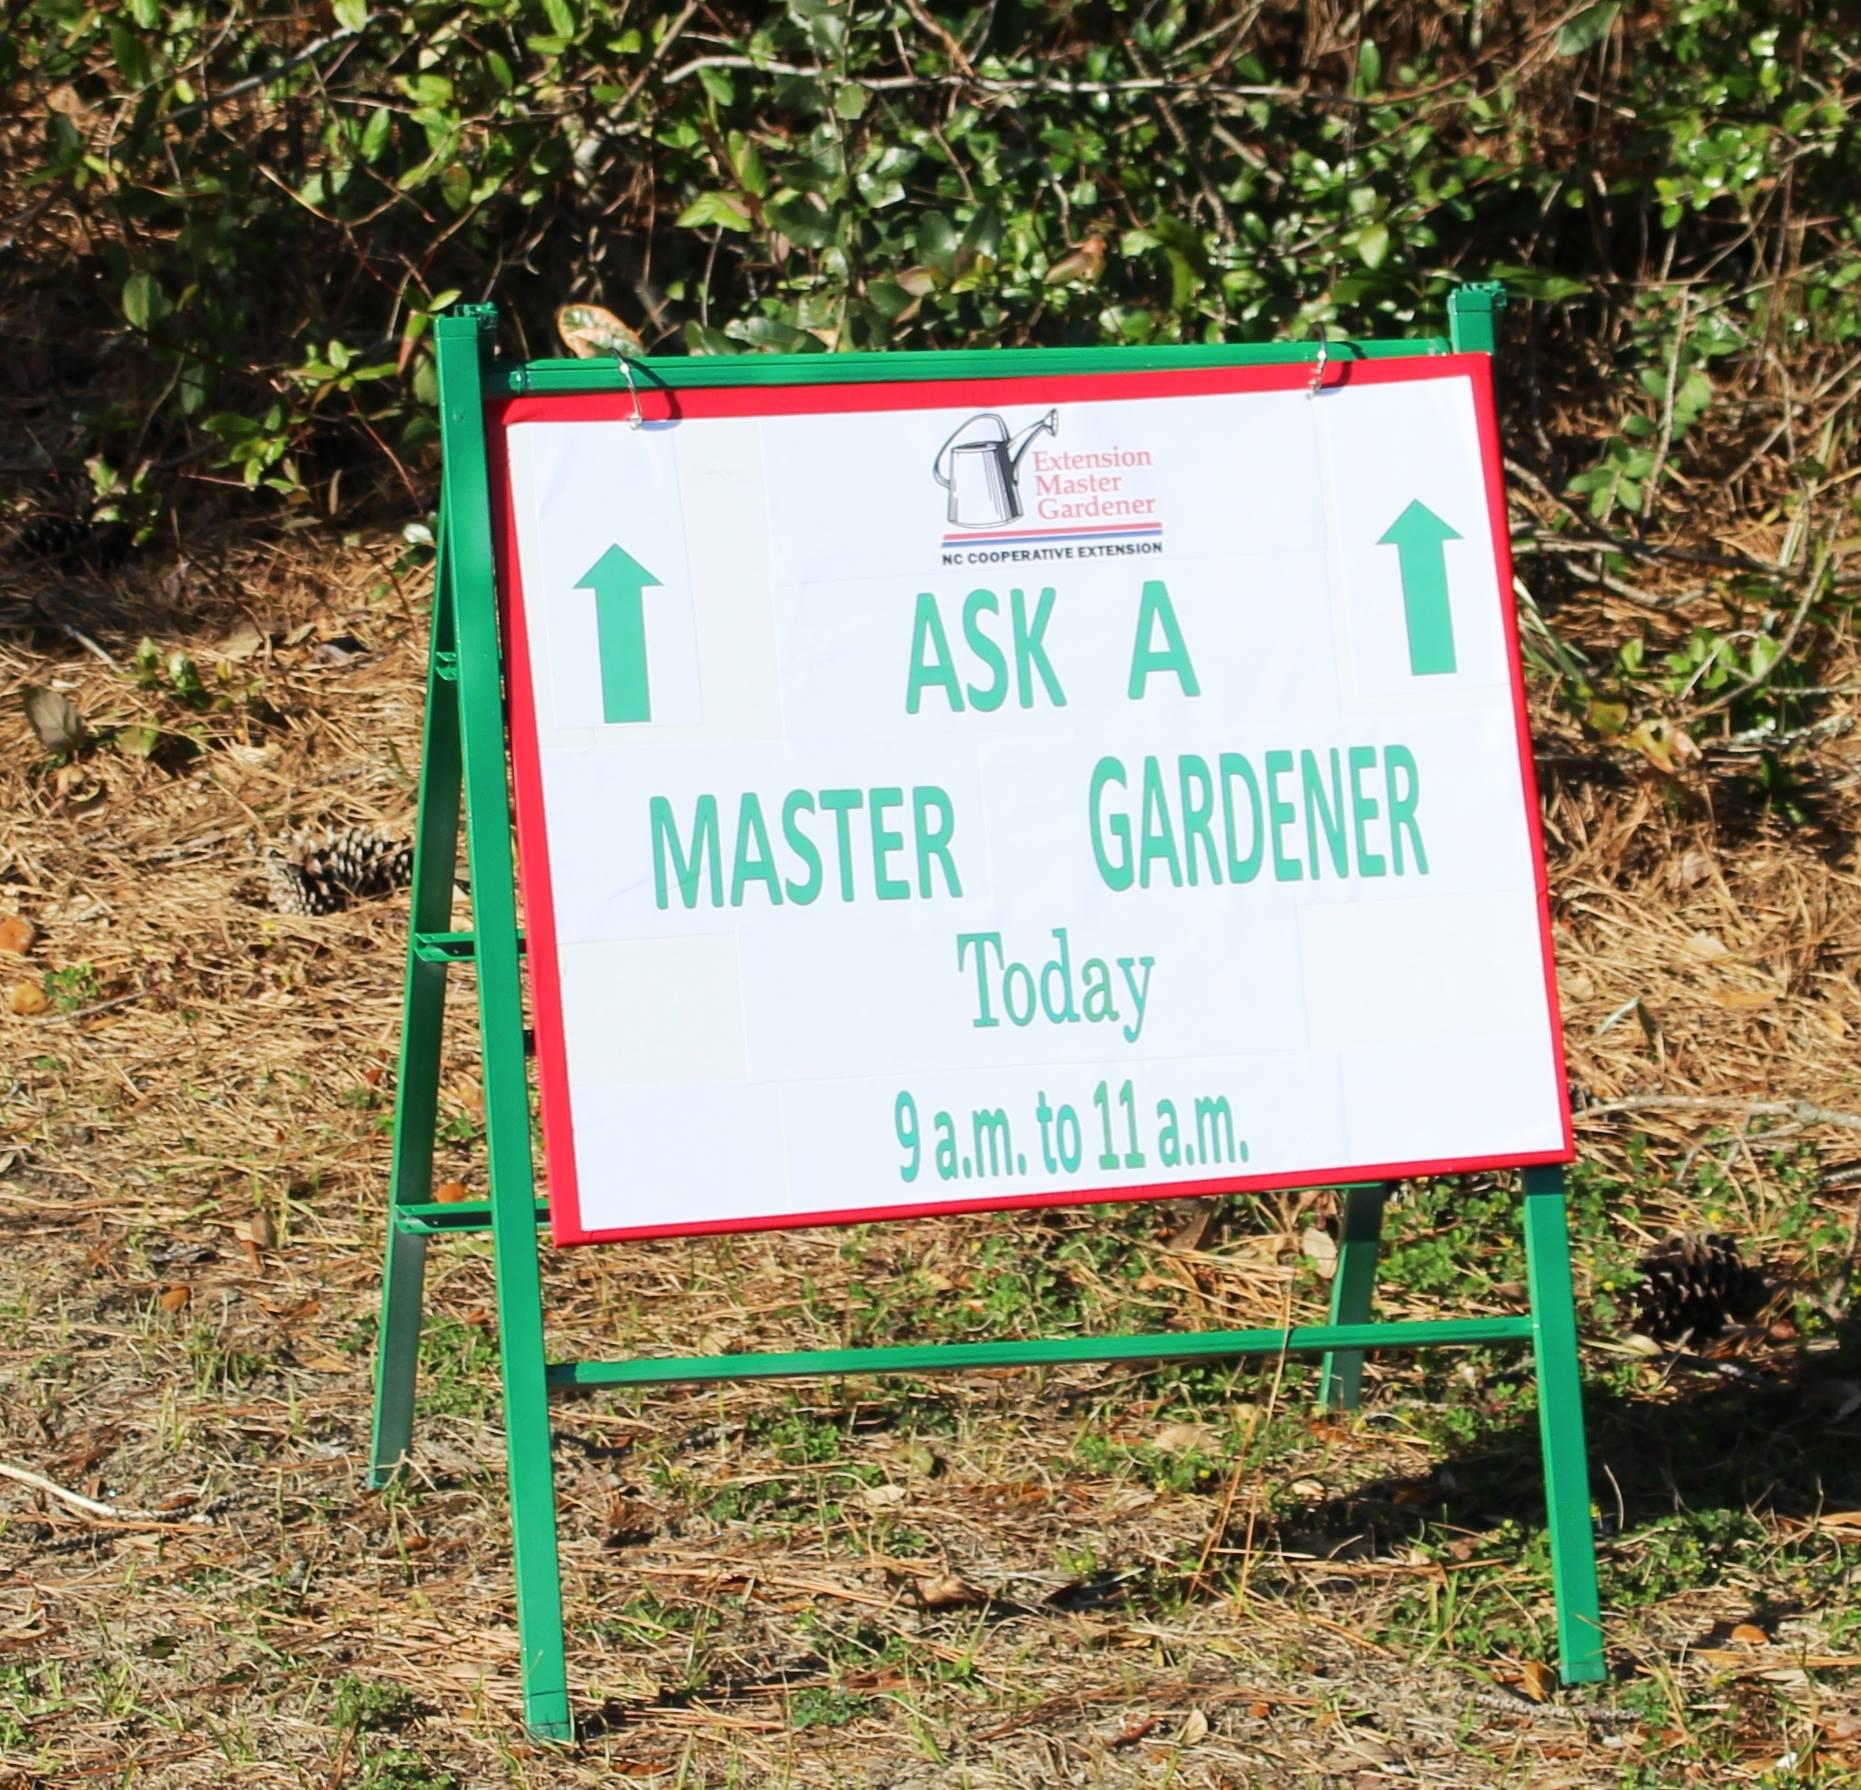 Ask a Master Gardener sign